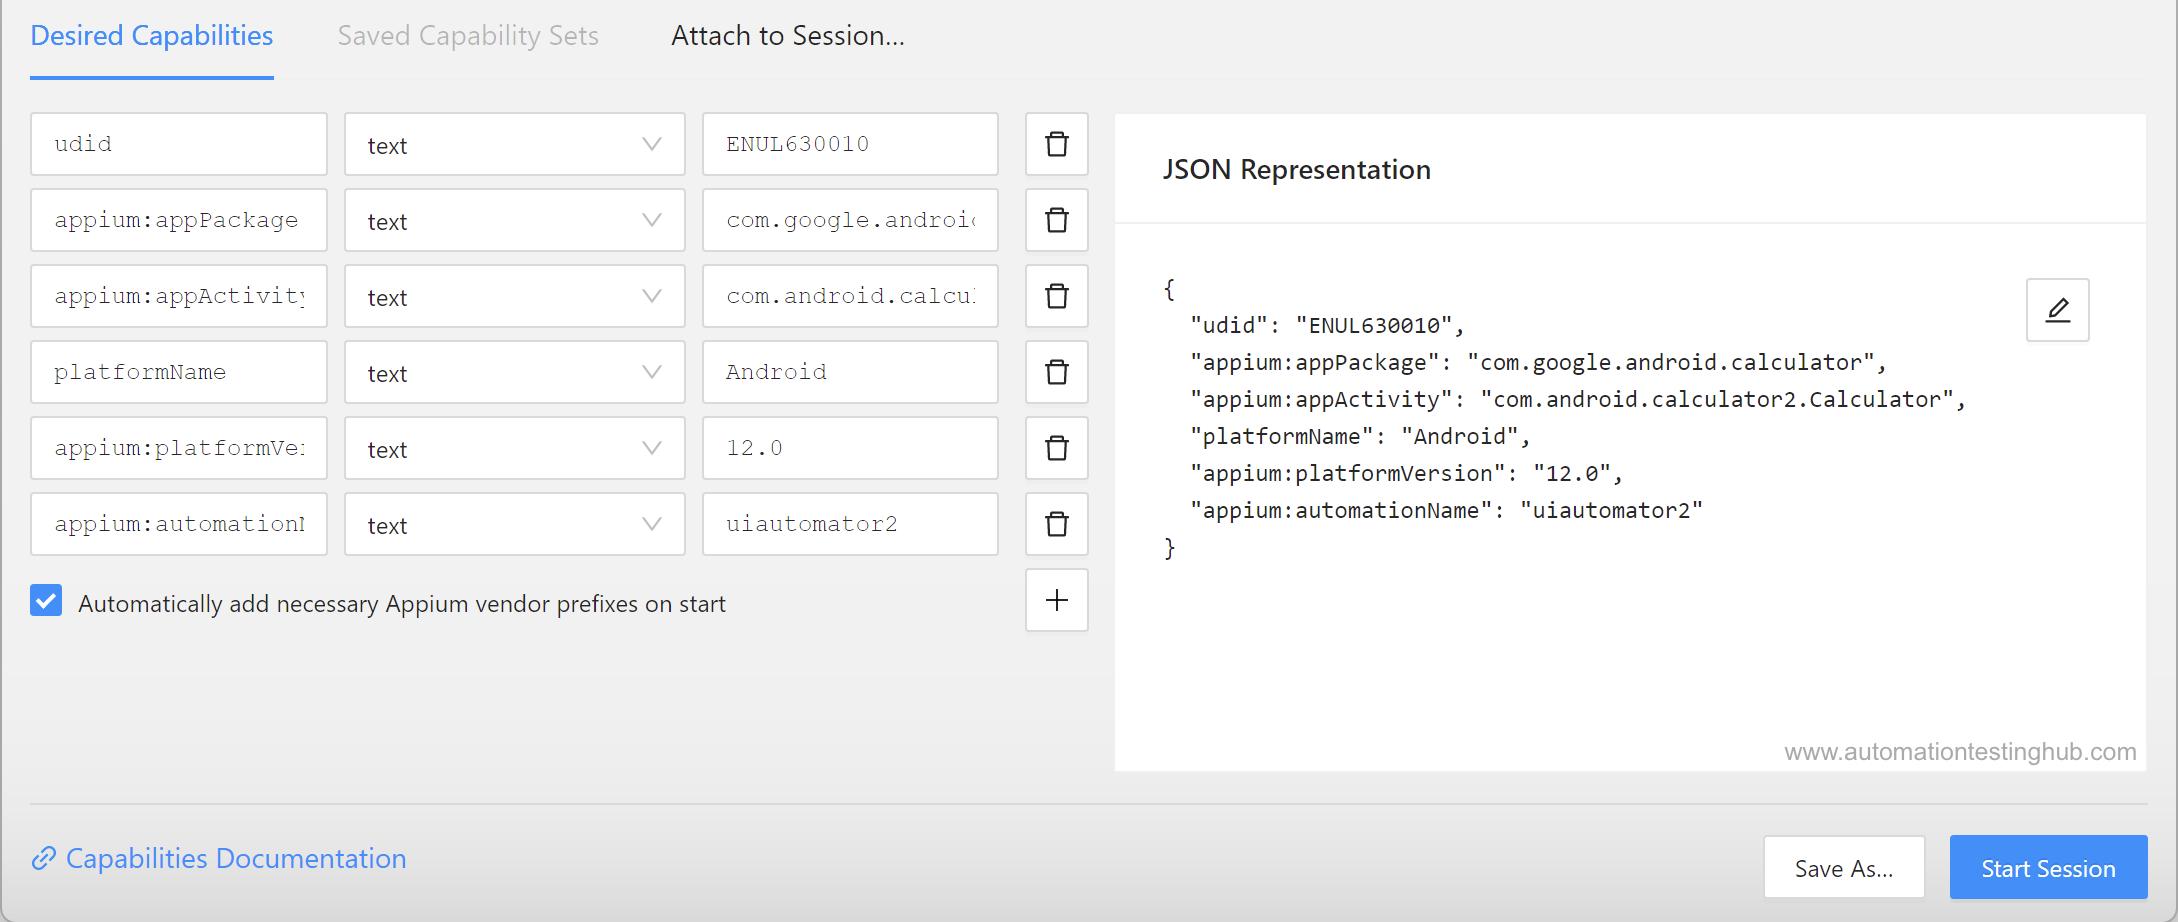 Appium Desktop Inspector - Part 1 - AutomationTestingHub